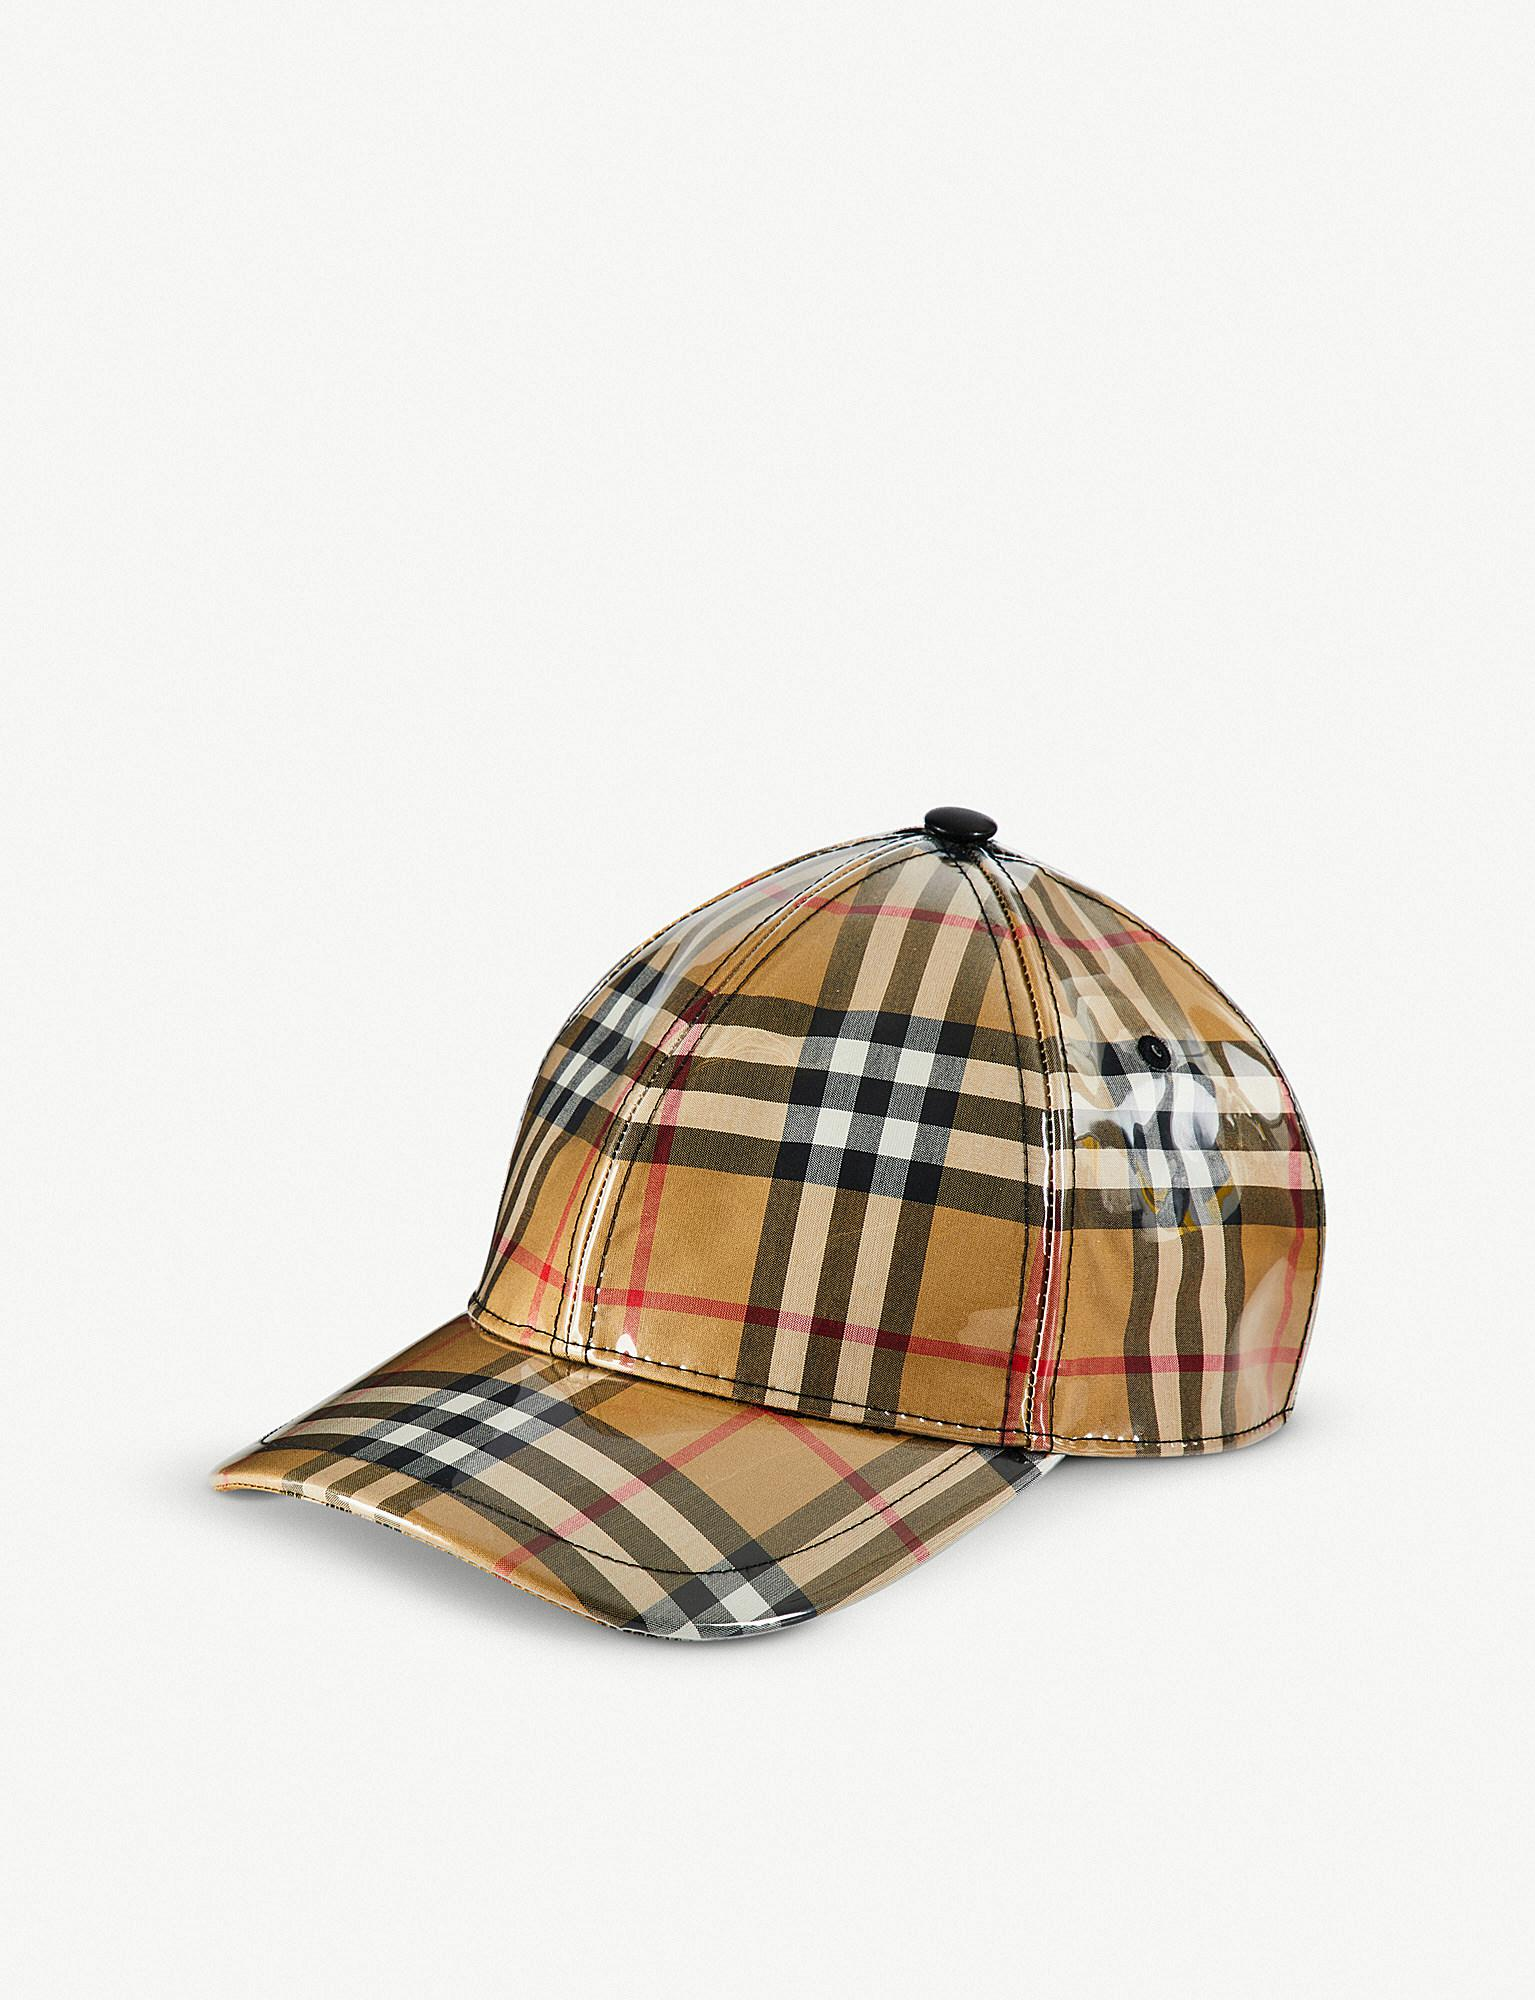 68fa63663e Burberry Vintage Check Pvc Baseball Cap for Men - Lyst